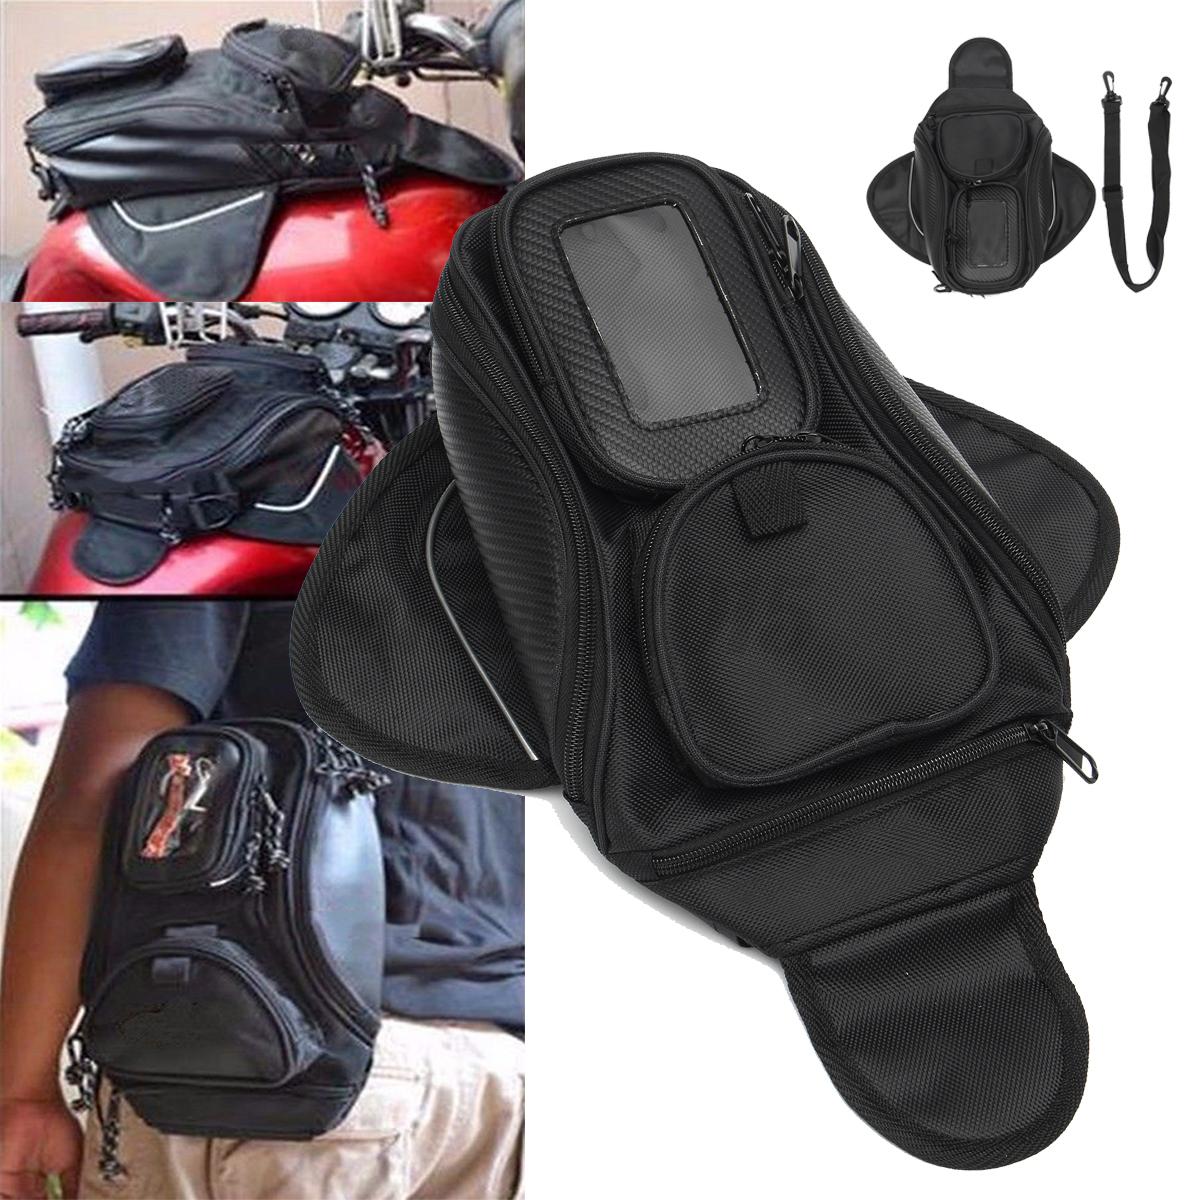 magnet motorrad tanktasche tankrucksack tasche sport. Black Bedroom Furniture Sets. Home Design Ideas